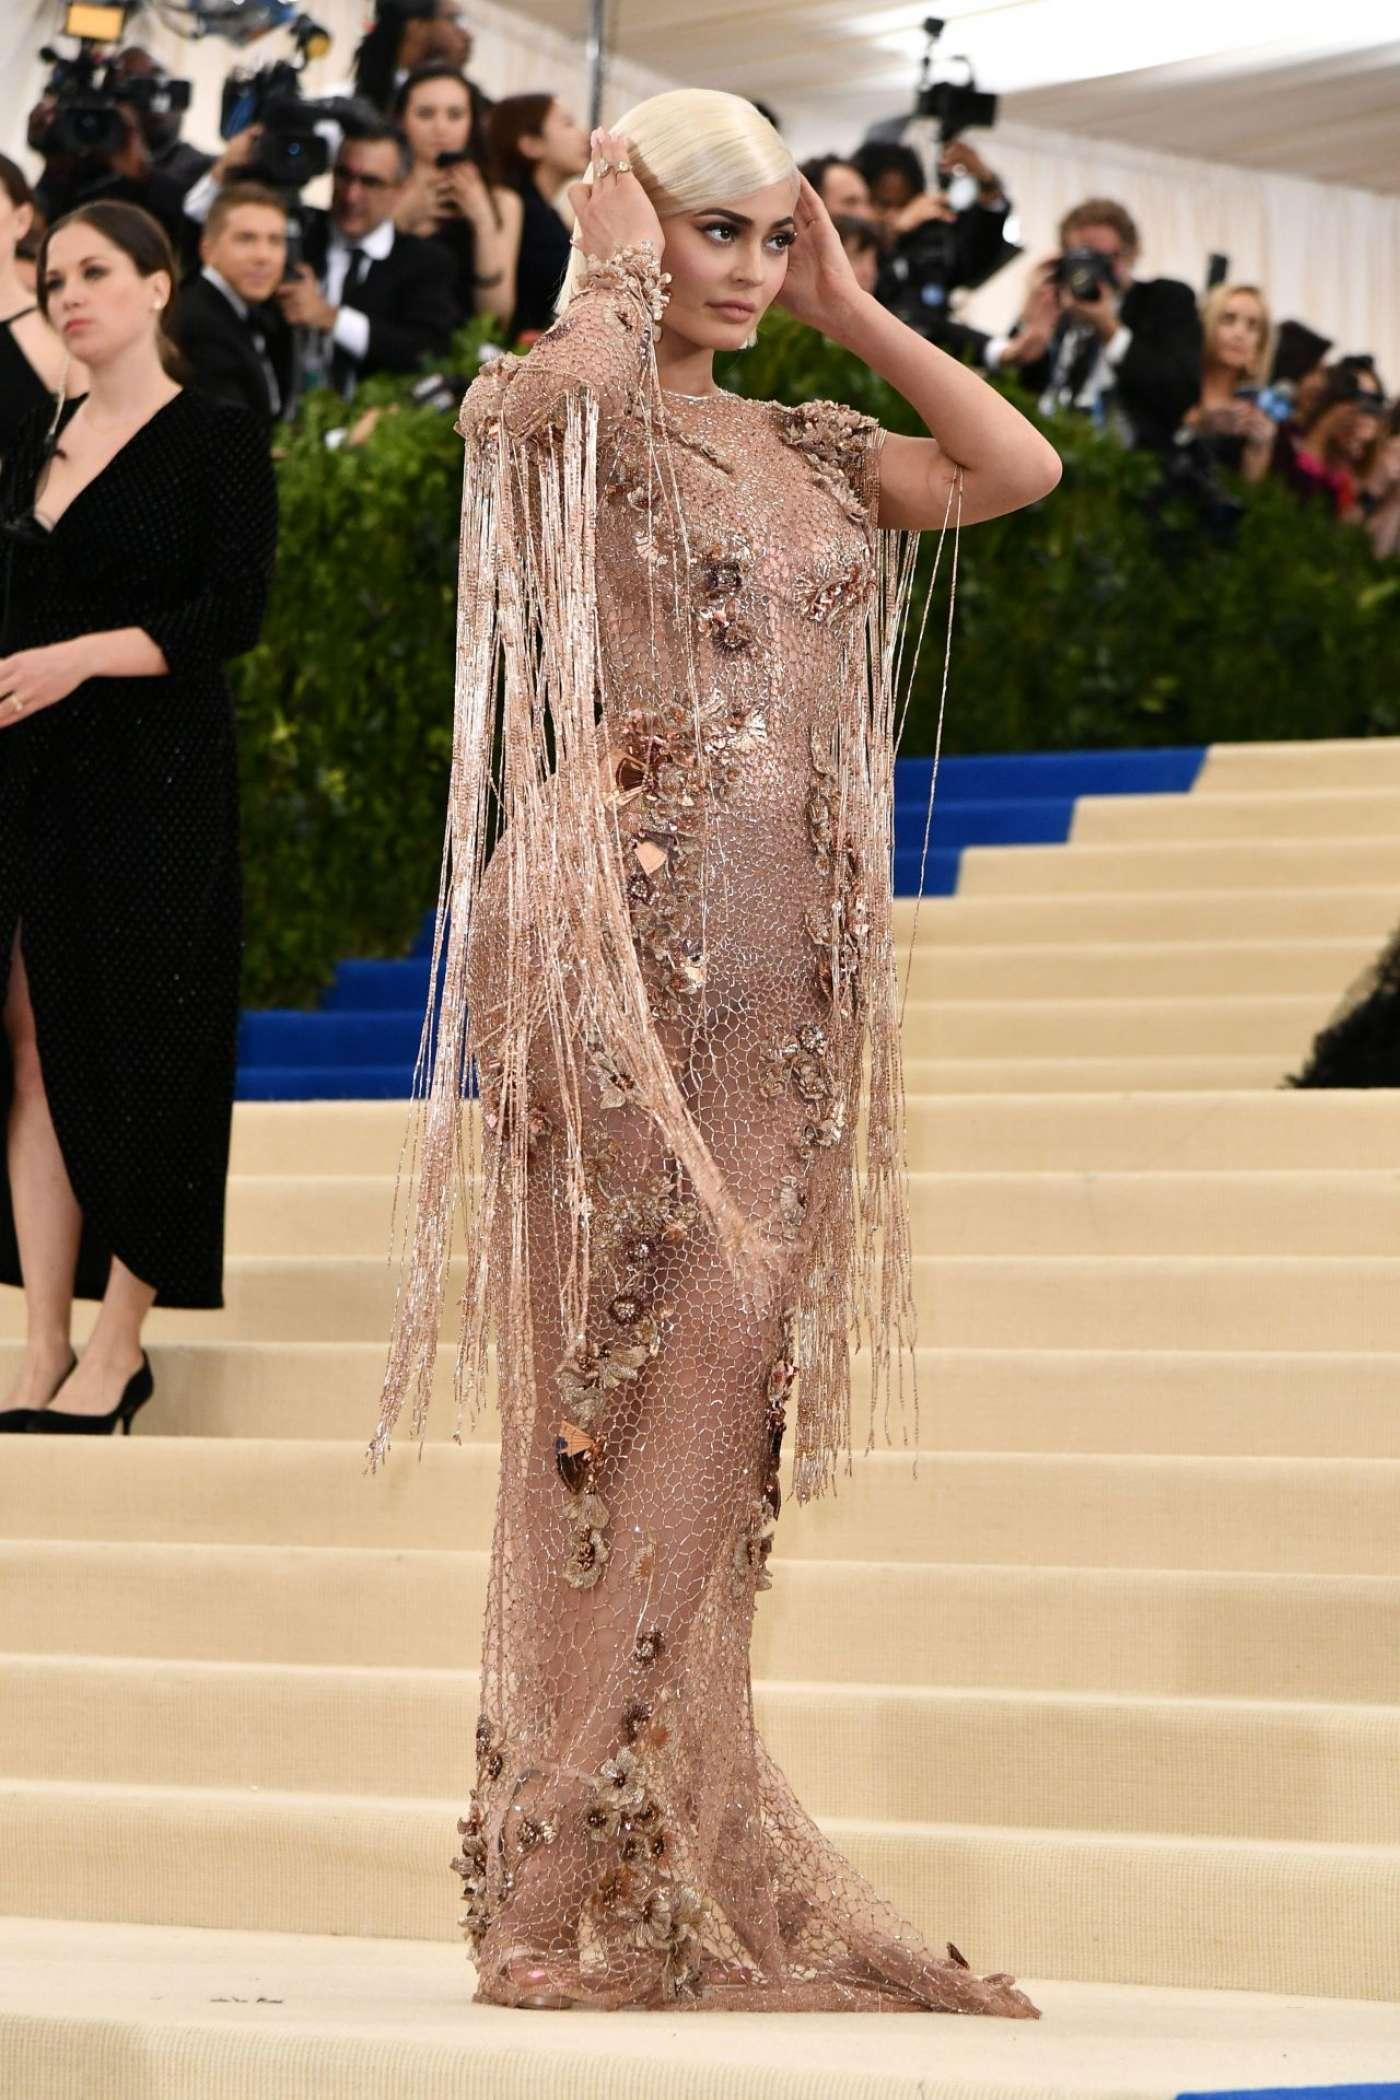 Kylie Jenner 2017 Met Costume Institute Gala 04 Gotceleb